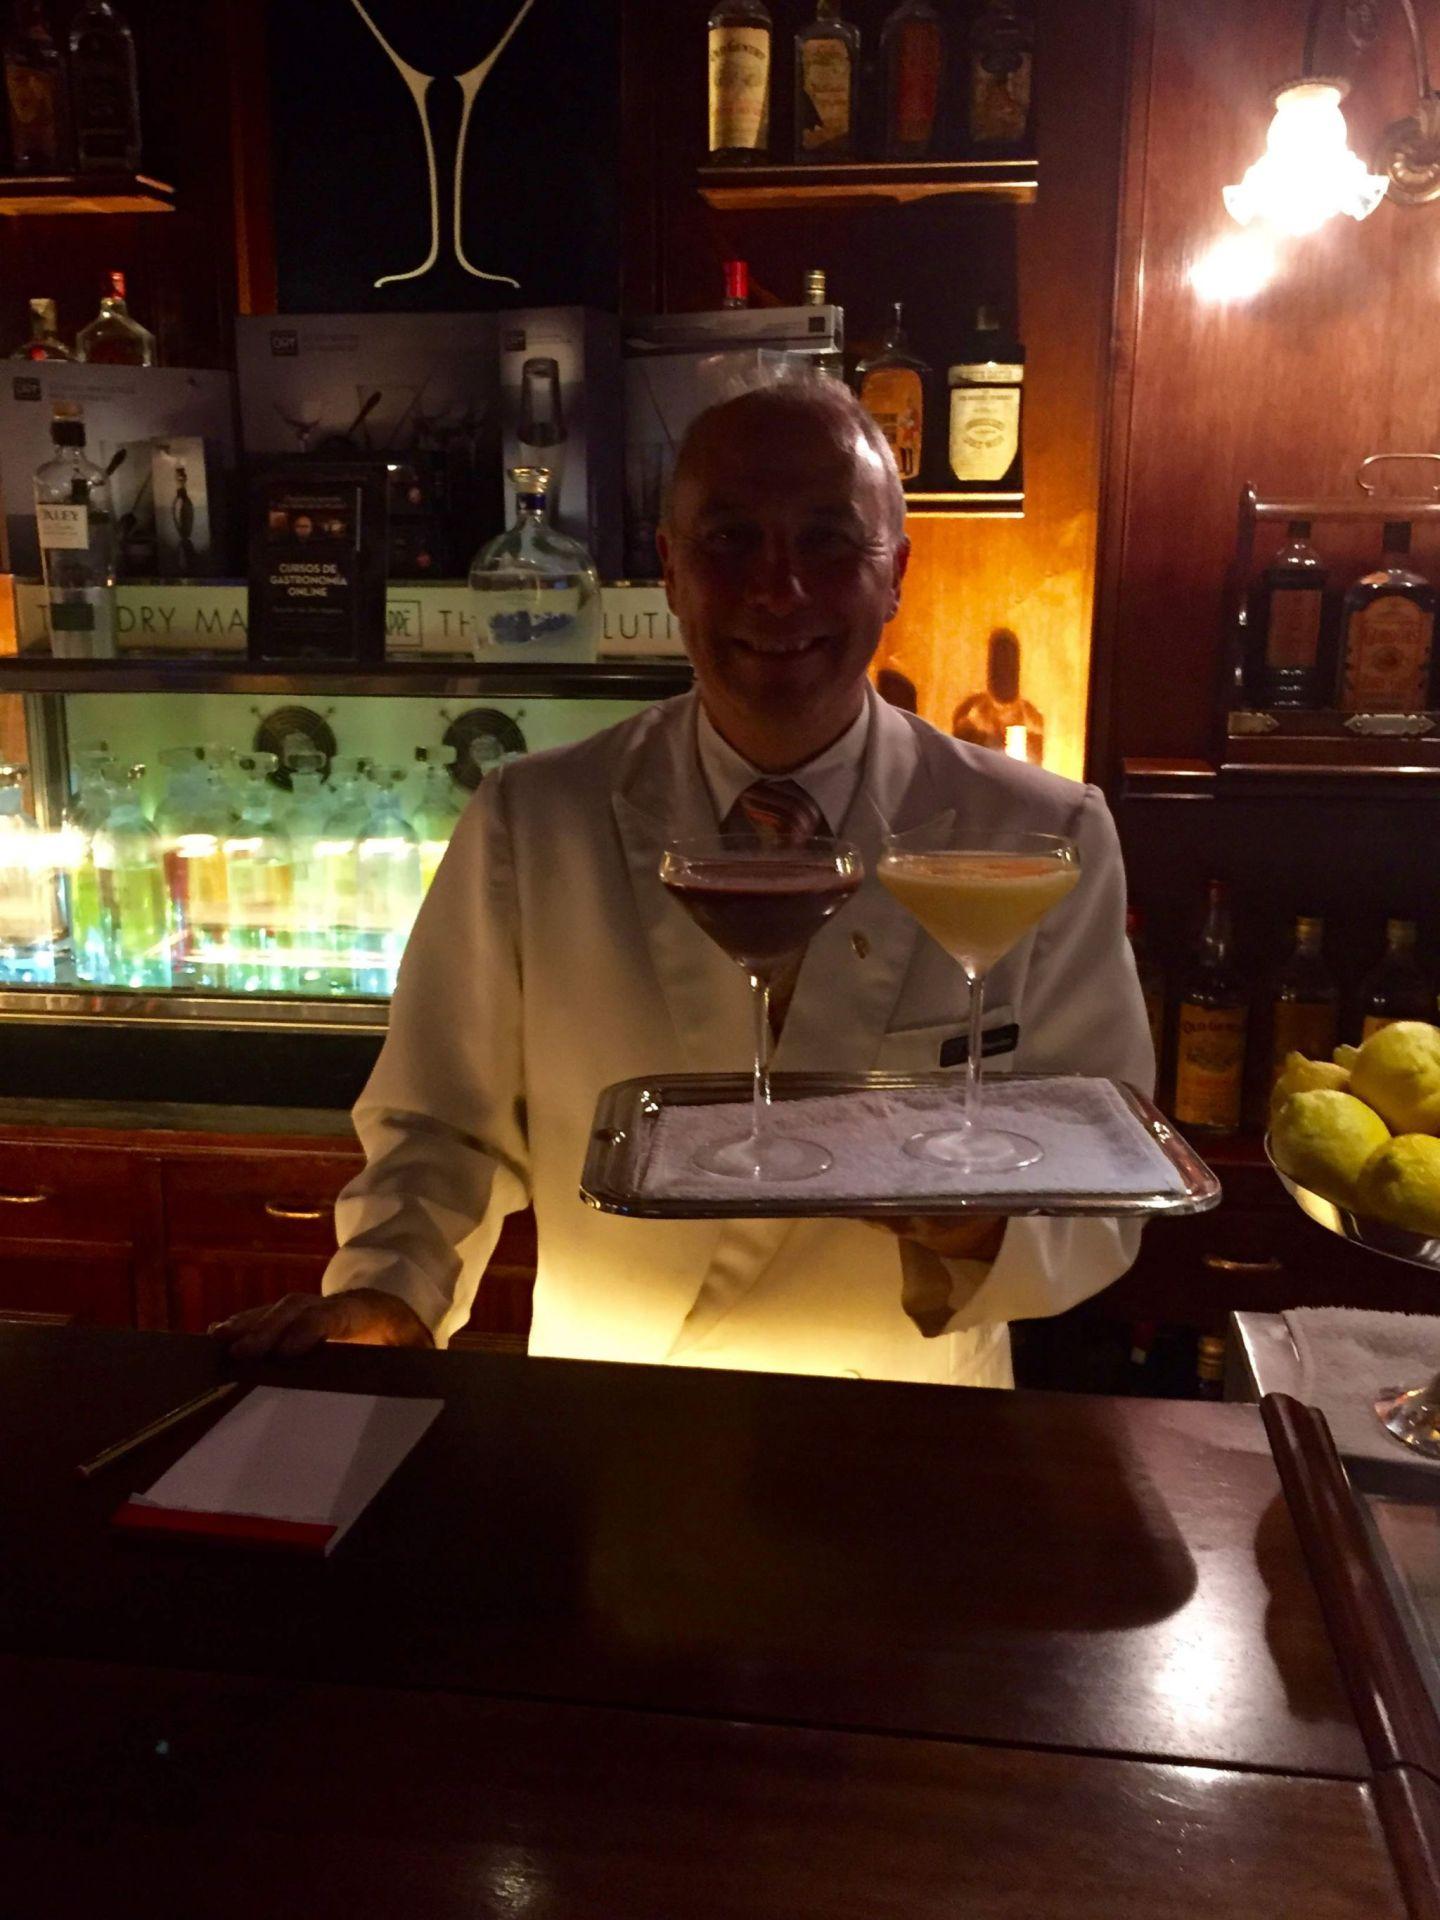 Cocktails served at Dry Martini, Barcelona